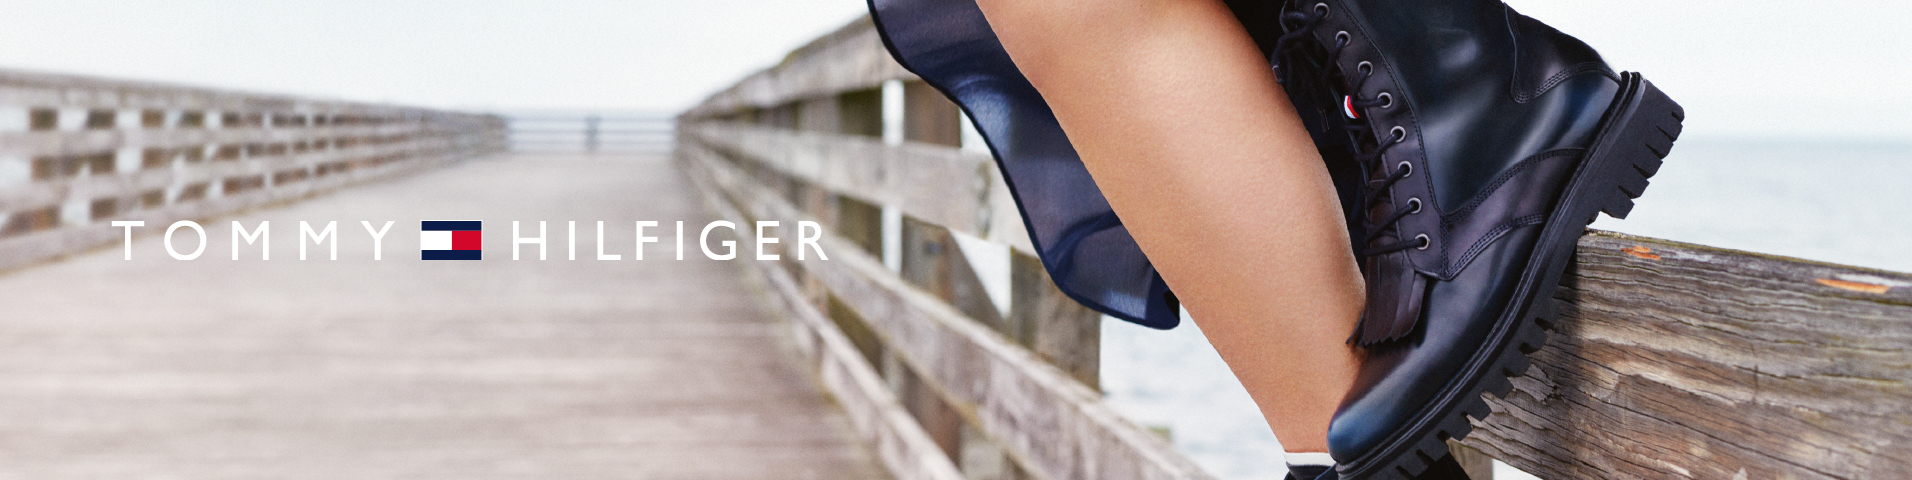 e5444f672e8 Tommy Hilfiger Women's Shoes | Mules to Block Heels | ZALANDO UK